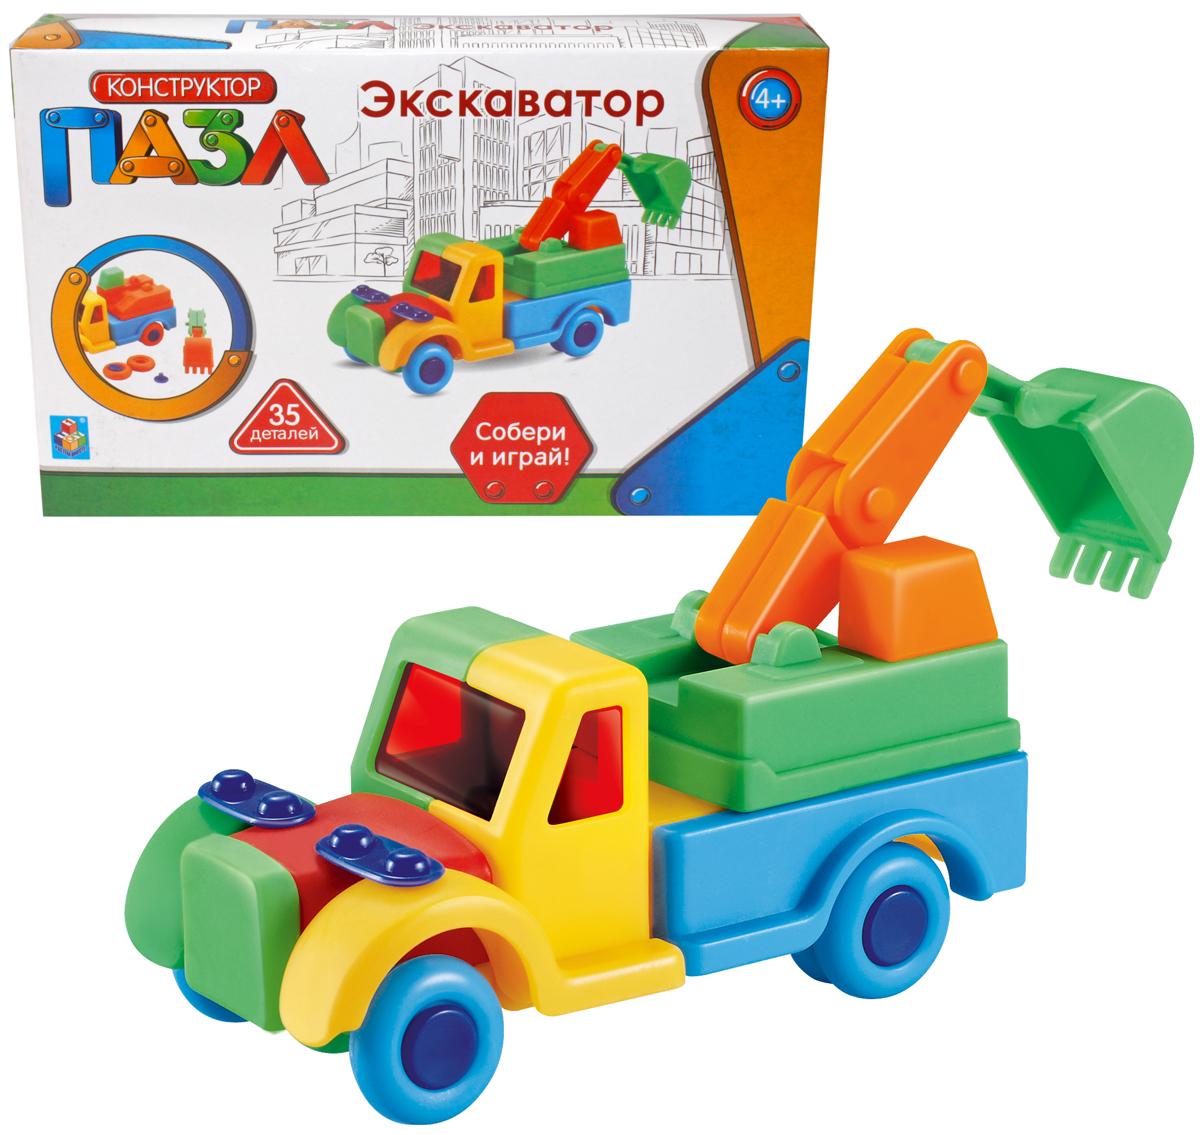 1 Toy Конструктор-пазл Экскаватор 35 элементов конструктор метал экскаватор 129 деталей 01108